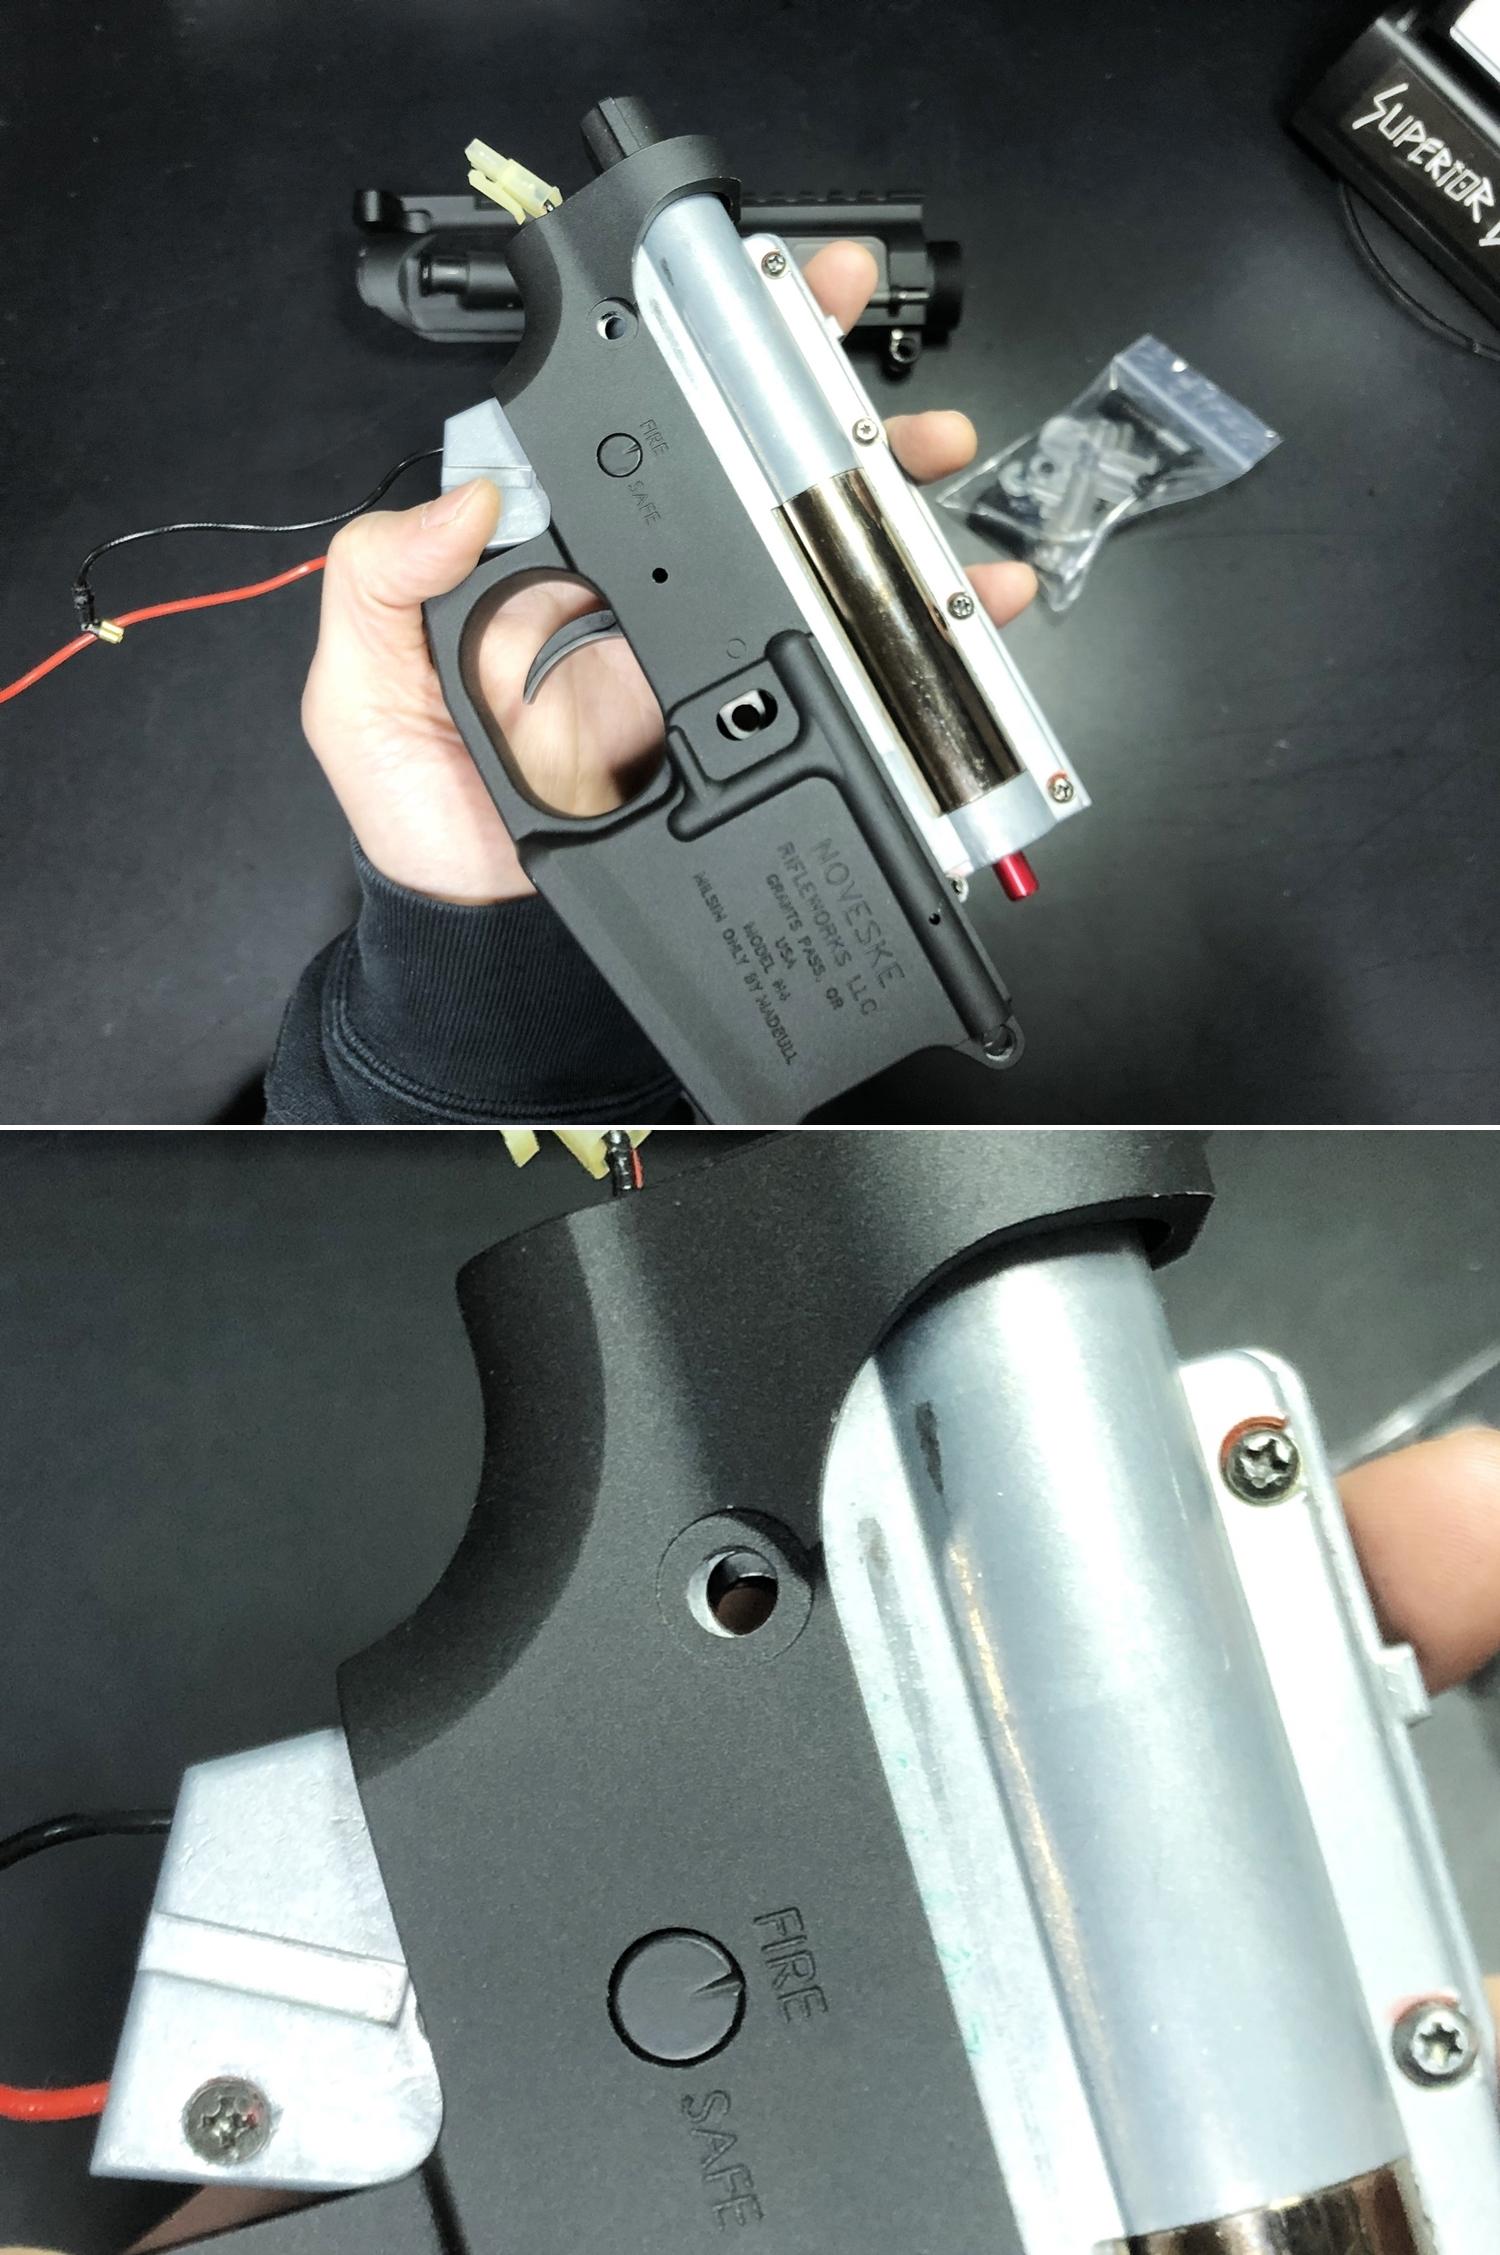 7 NOVESKE GEN3 N4 BY MADBULL!! 『第一弾』 新たにSTD民間系ARを作り始めたいと思います!! STD AR-15 M4 スタンダード 電動ガン マルイ ノベスケ ノベスキー マットブル メタルフレーム 動作テスト 組込 取付 カス